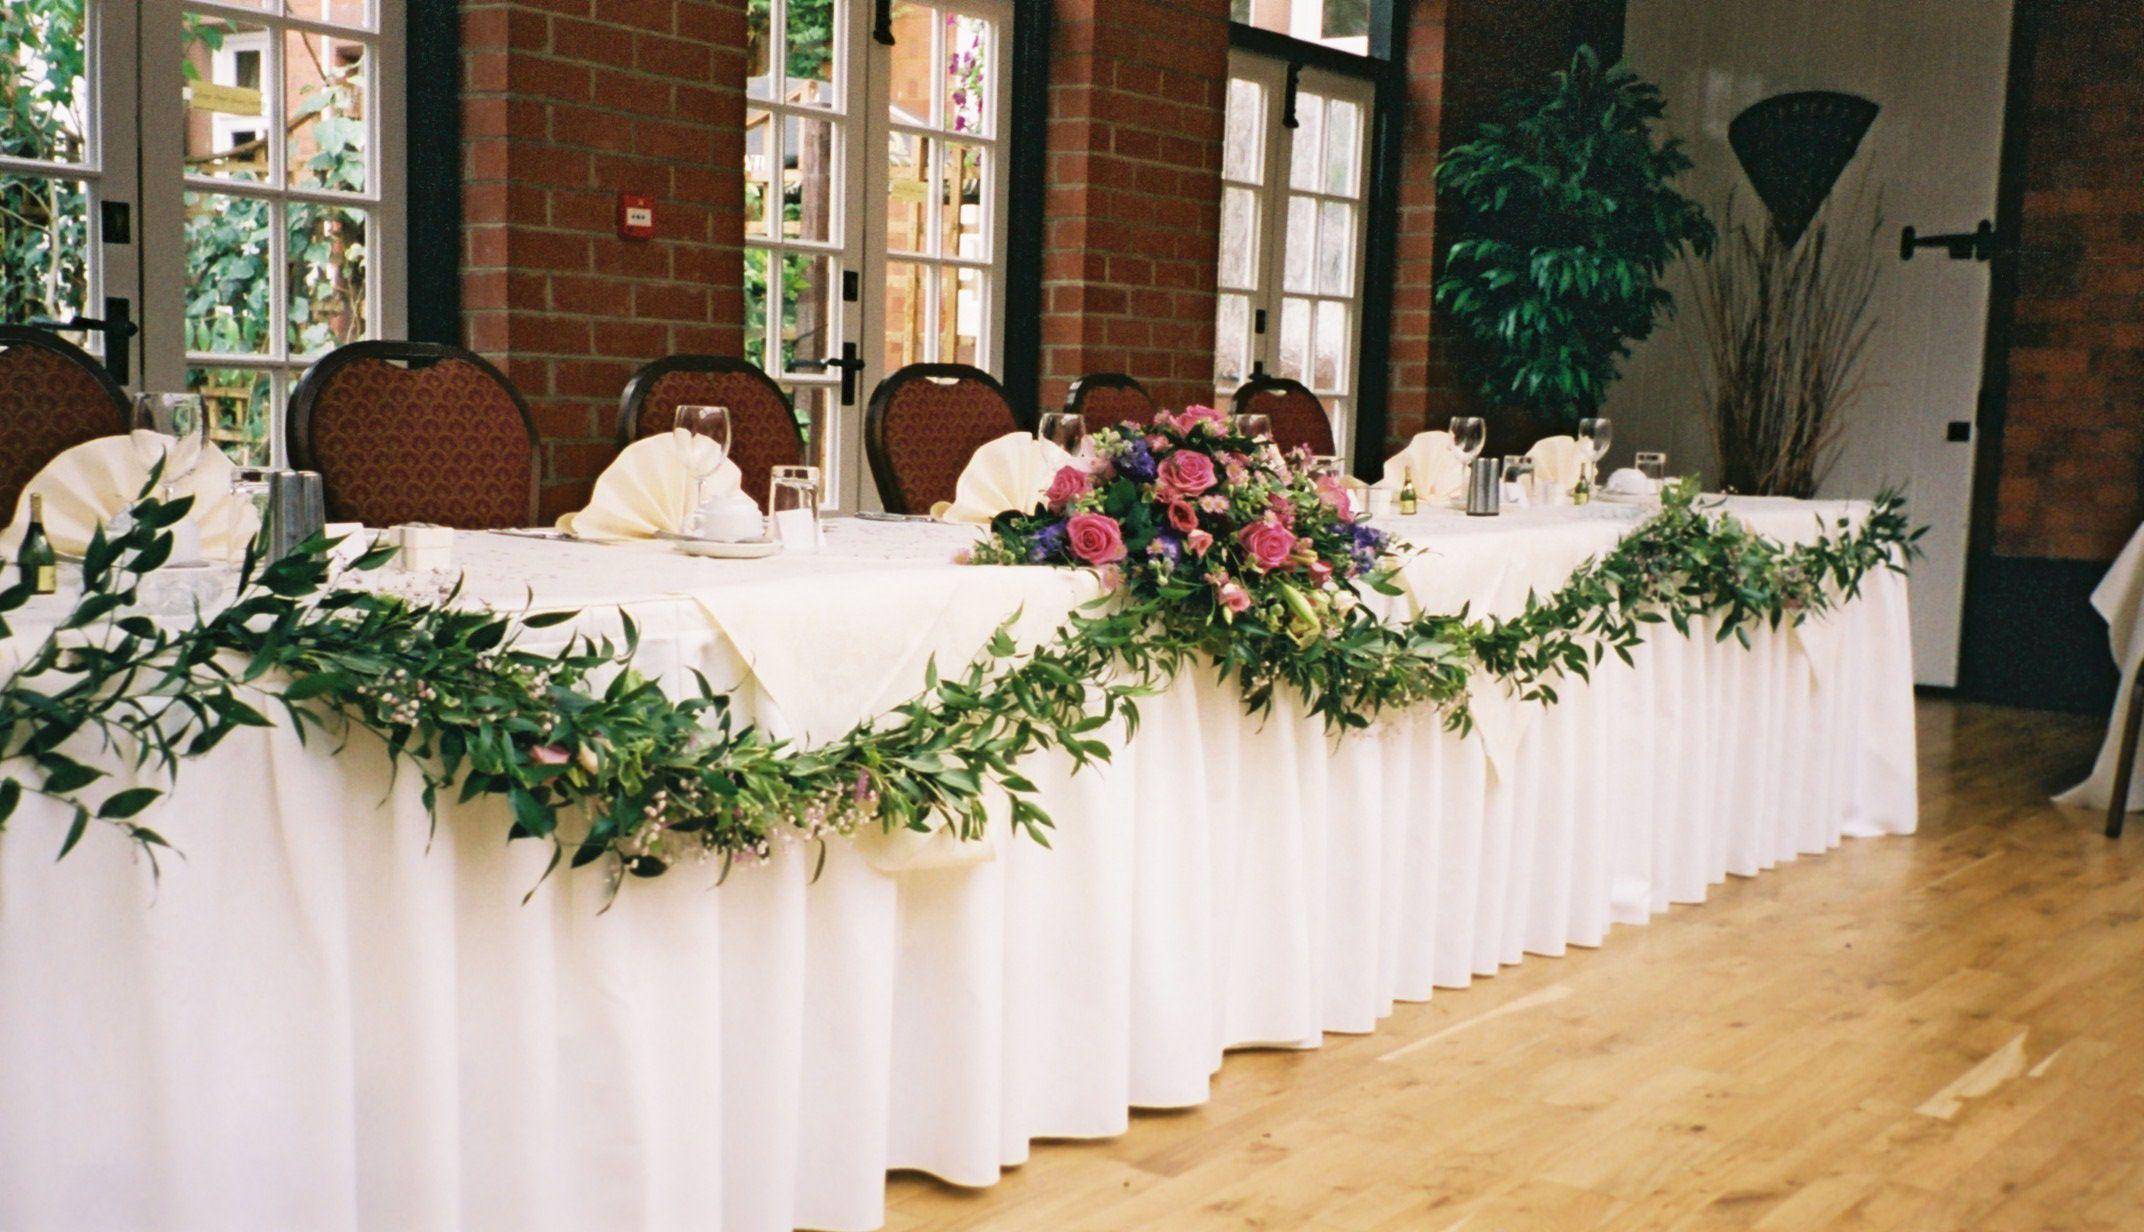 Head Table Decorations Wedding Reception Wedding Dress: #Wedding Reception #bridal #table #flowers Top Table